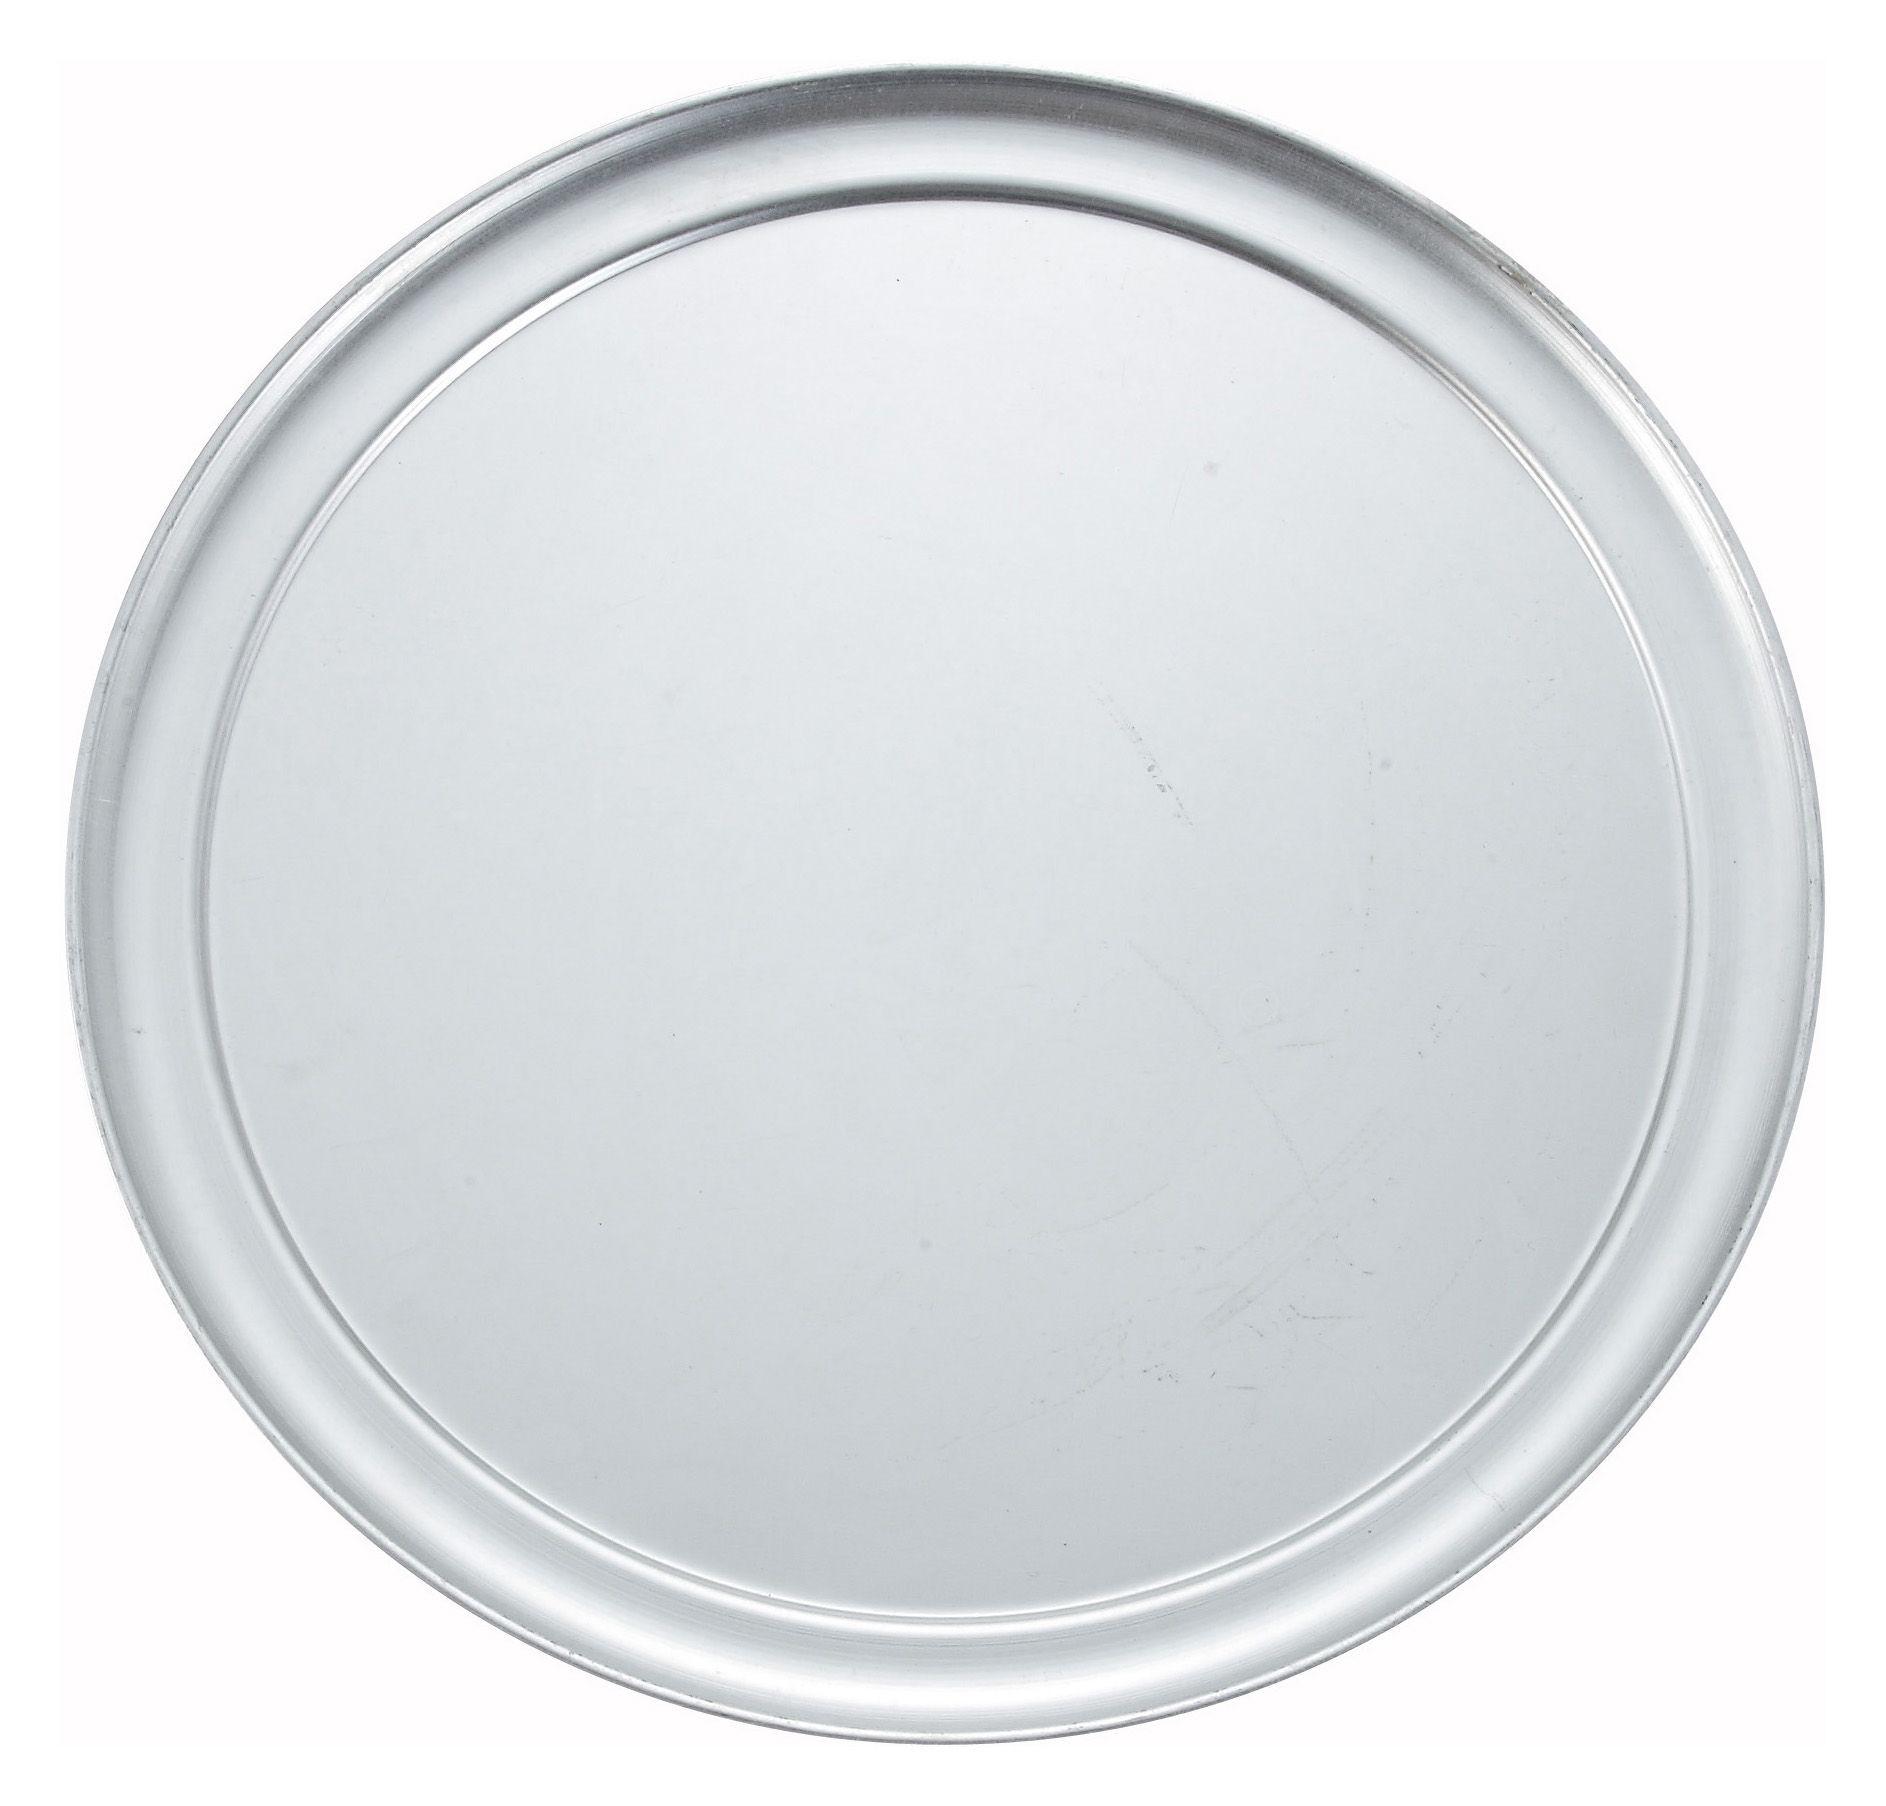 "Winco APZT-13 Wide-Rimmed Aluminum Pizza Pan 13"" Dia."